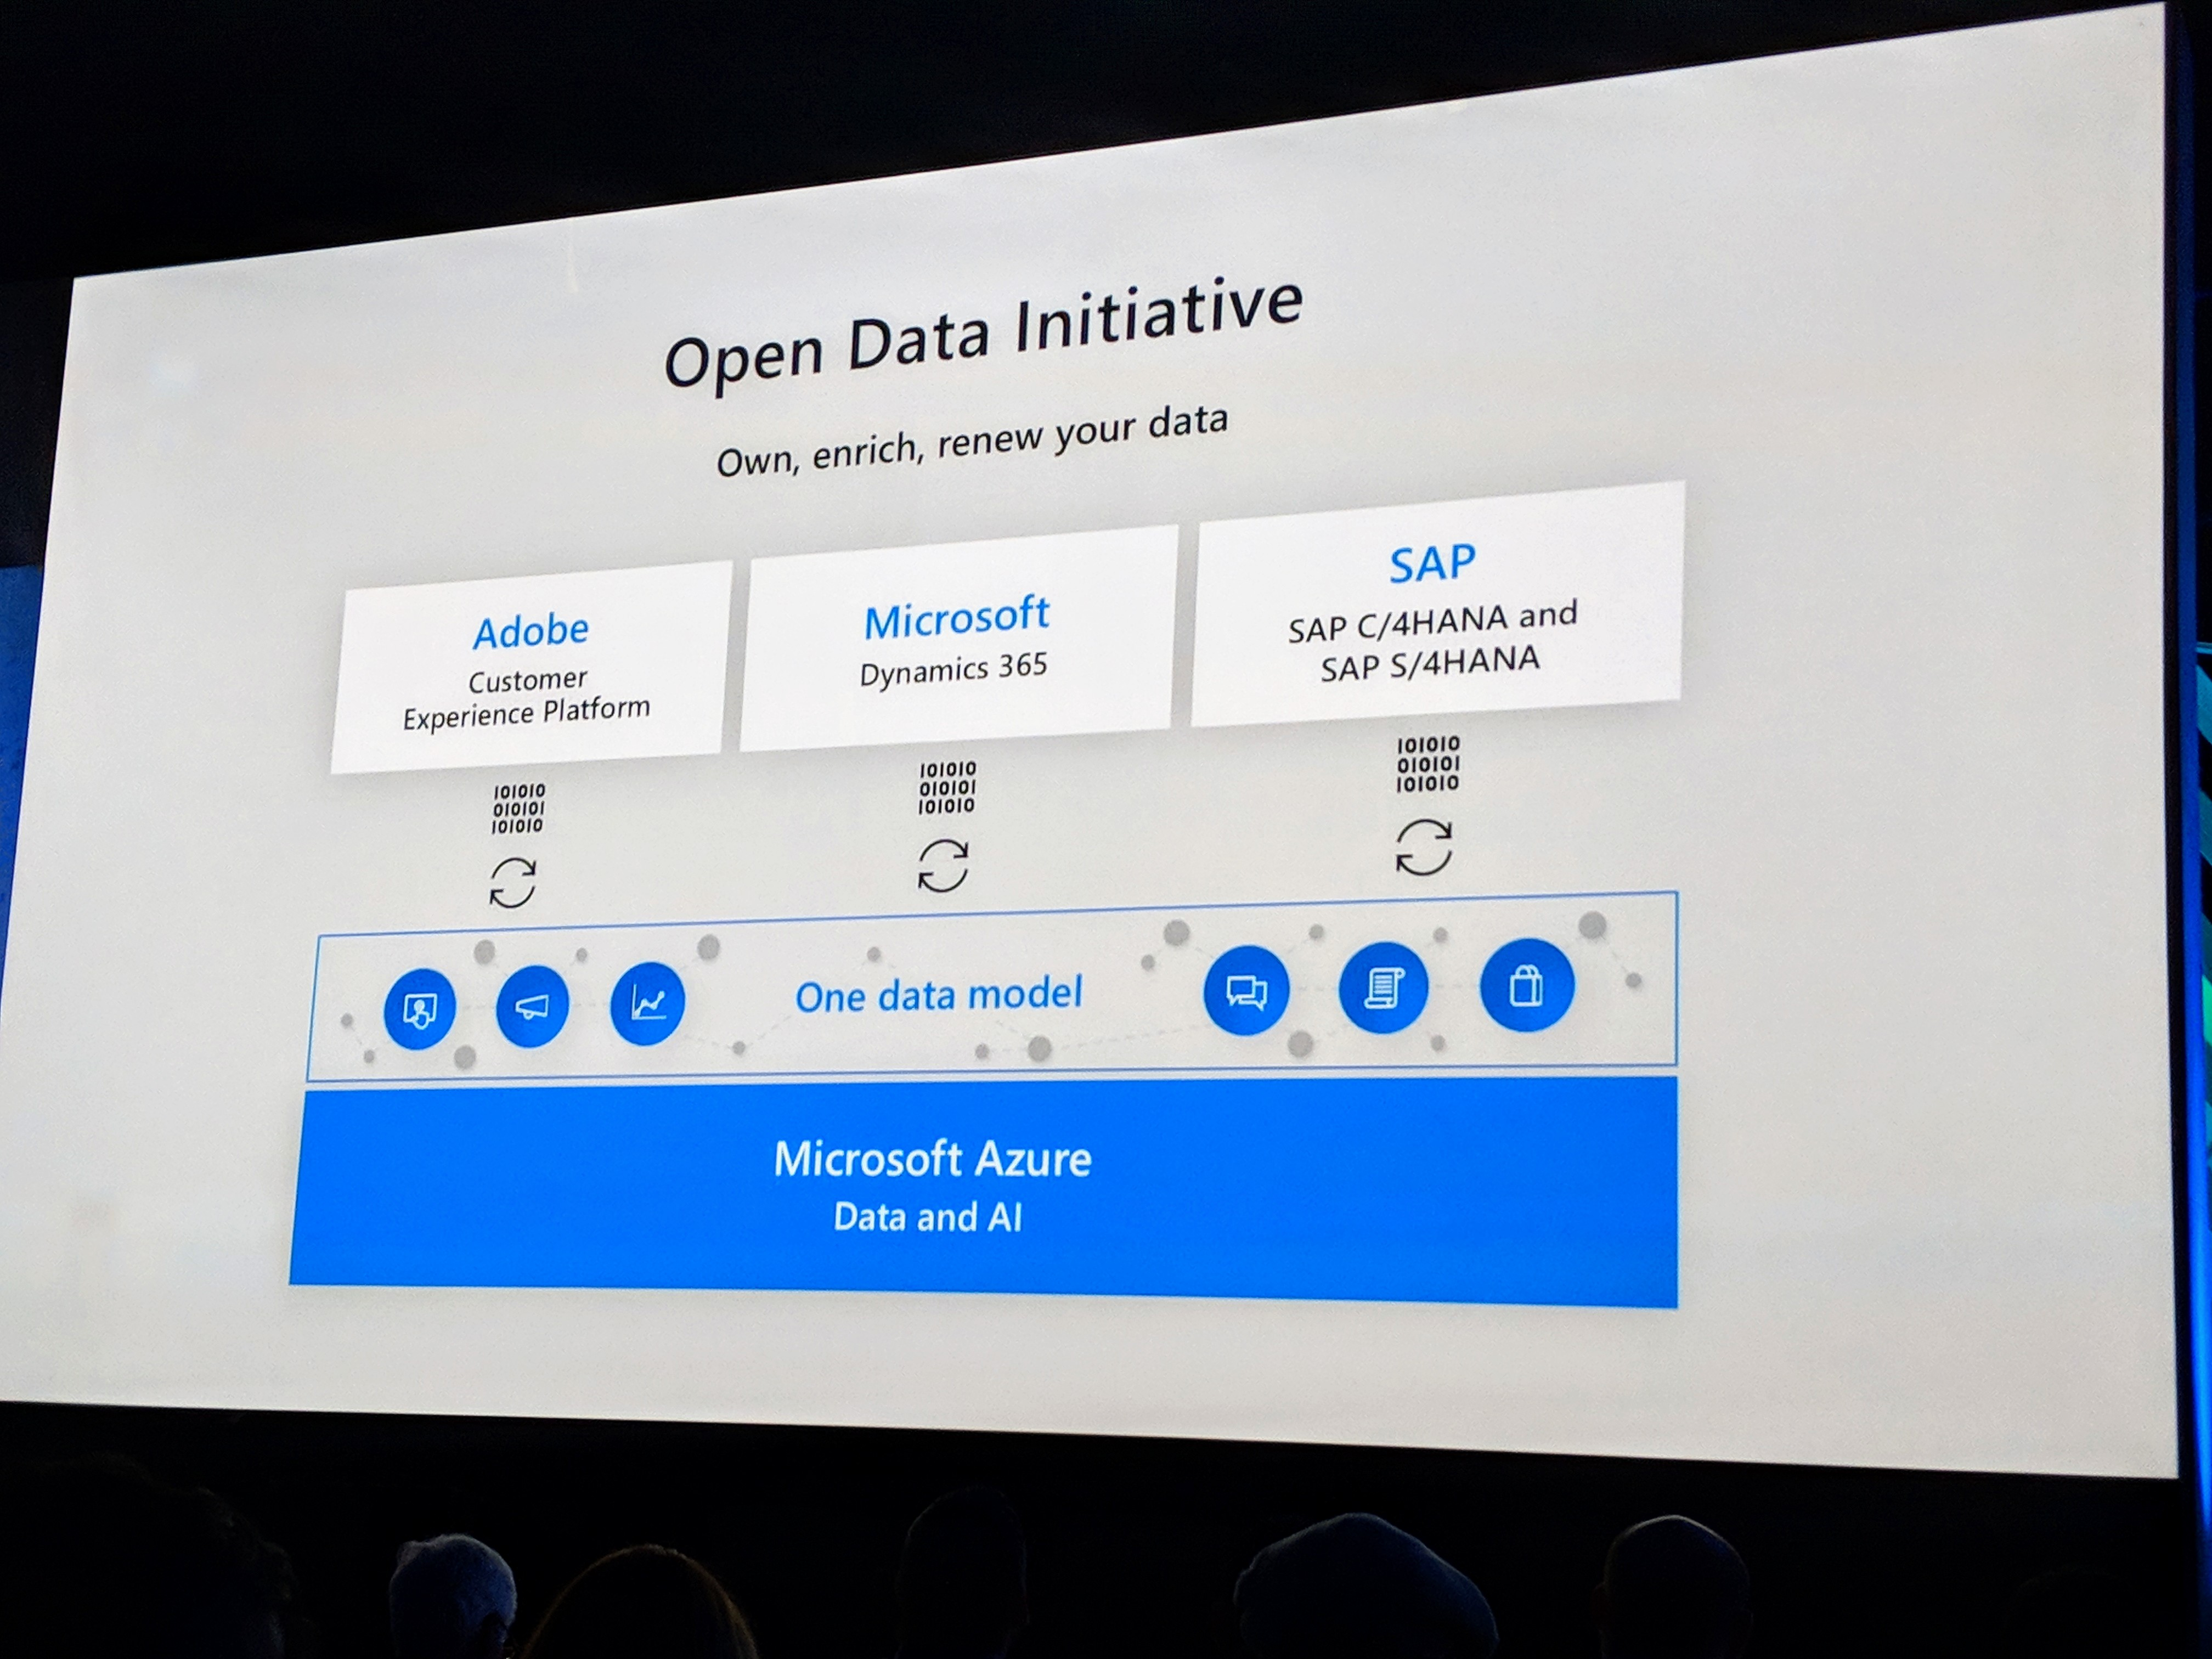 Microsoft, Adobe and SAP prepare to expand their Open Data Initiative Microsoft, Adobe and SAP prepare to expand their Open Data Initiative IMG 20180924 0934432